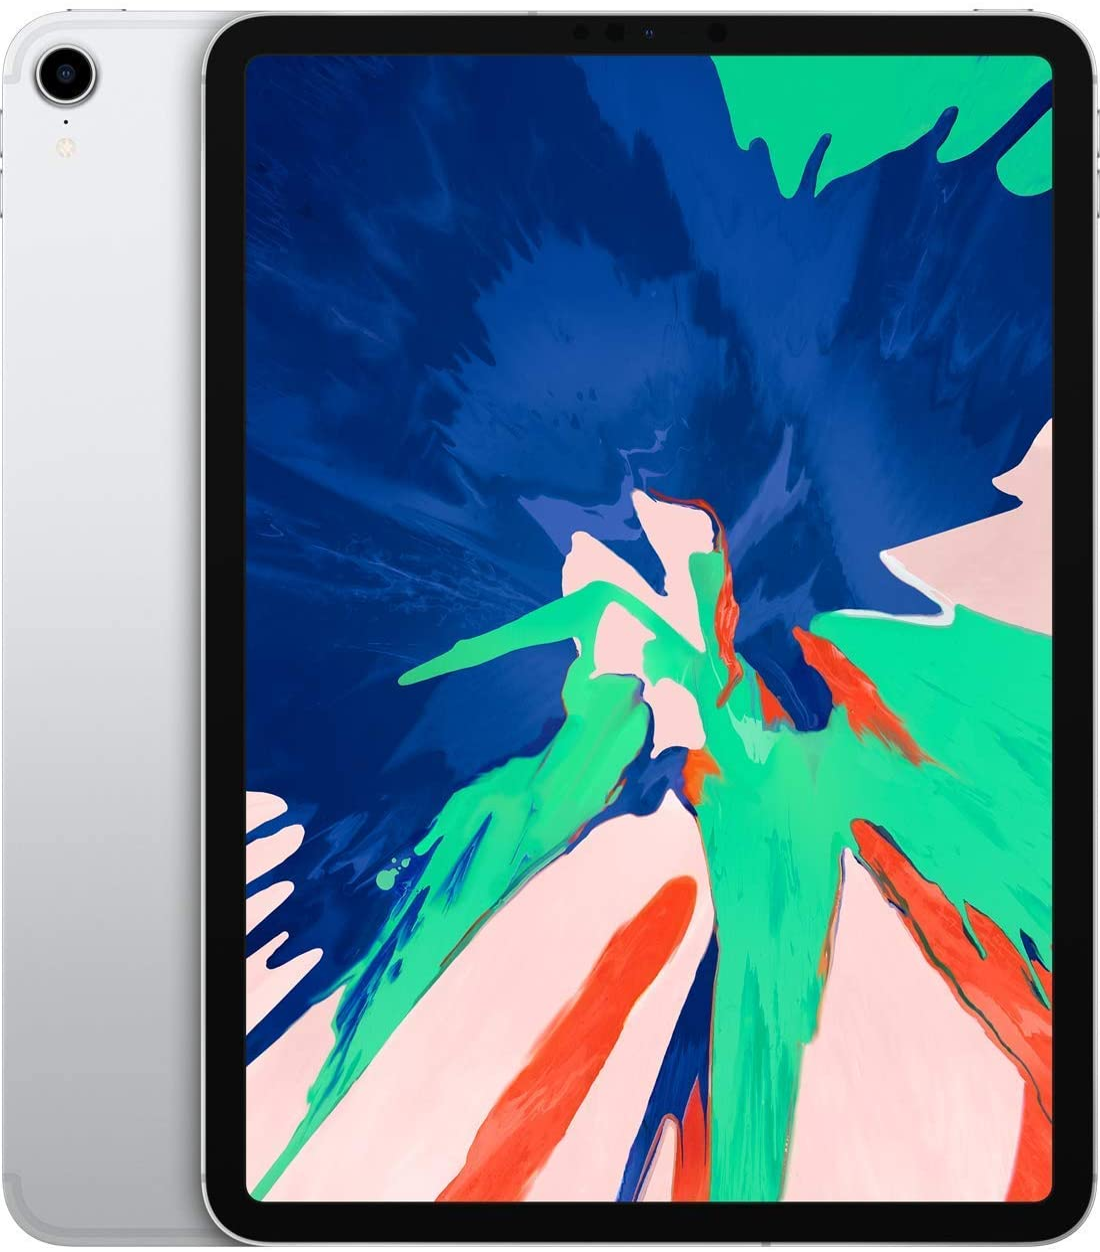 Apple iPad Pro 2018 (11-inch, Wi-Fi + Cellular, 64GB) - Silver (Renewed)